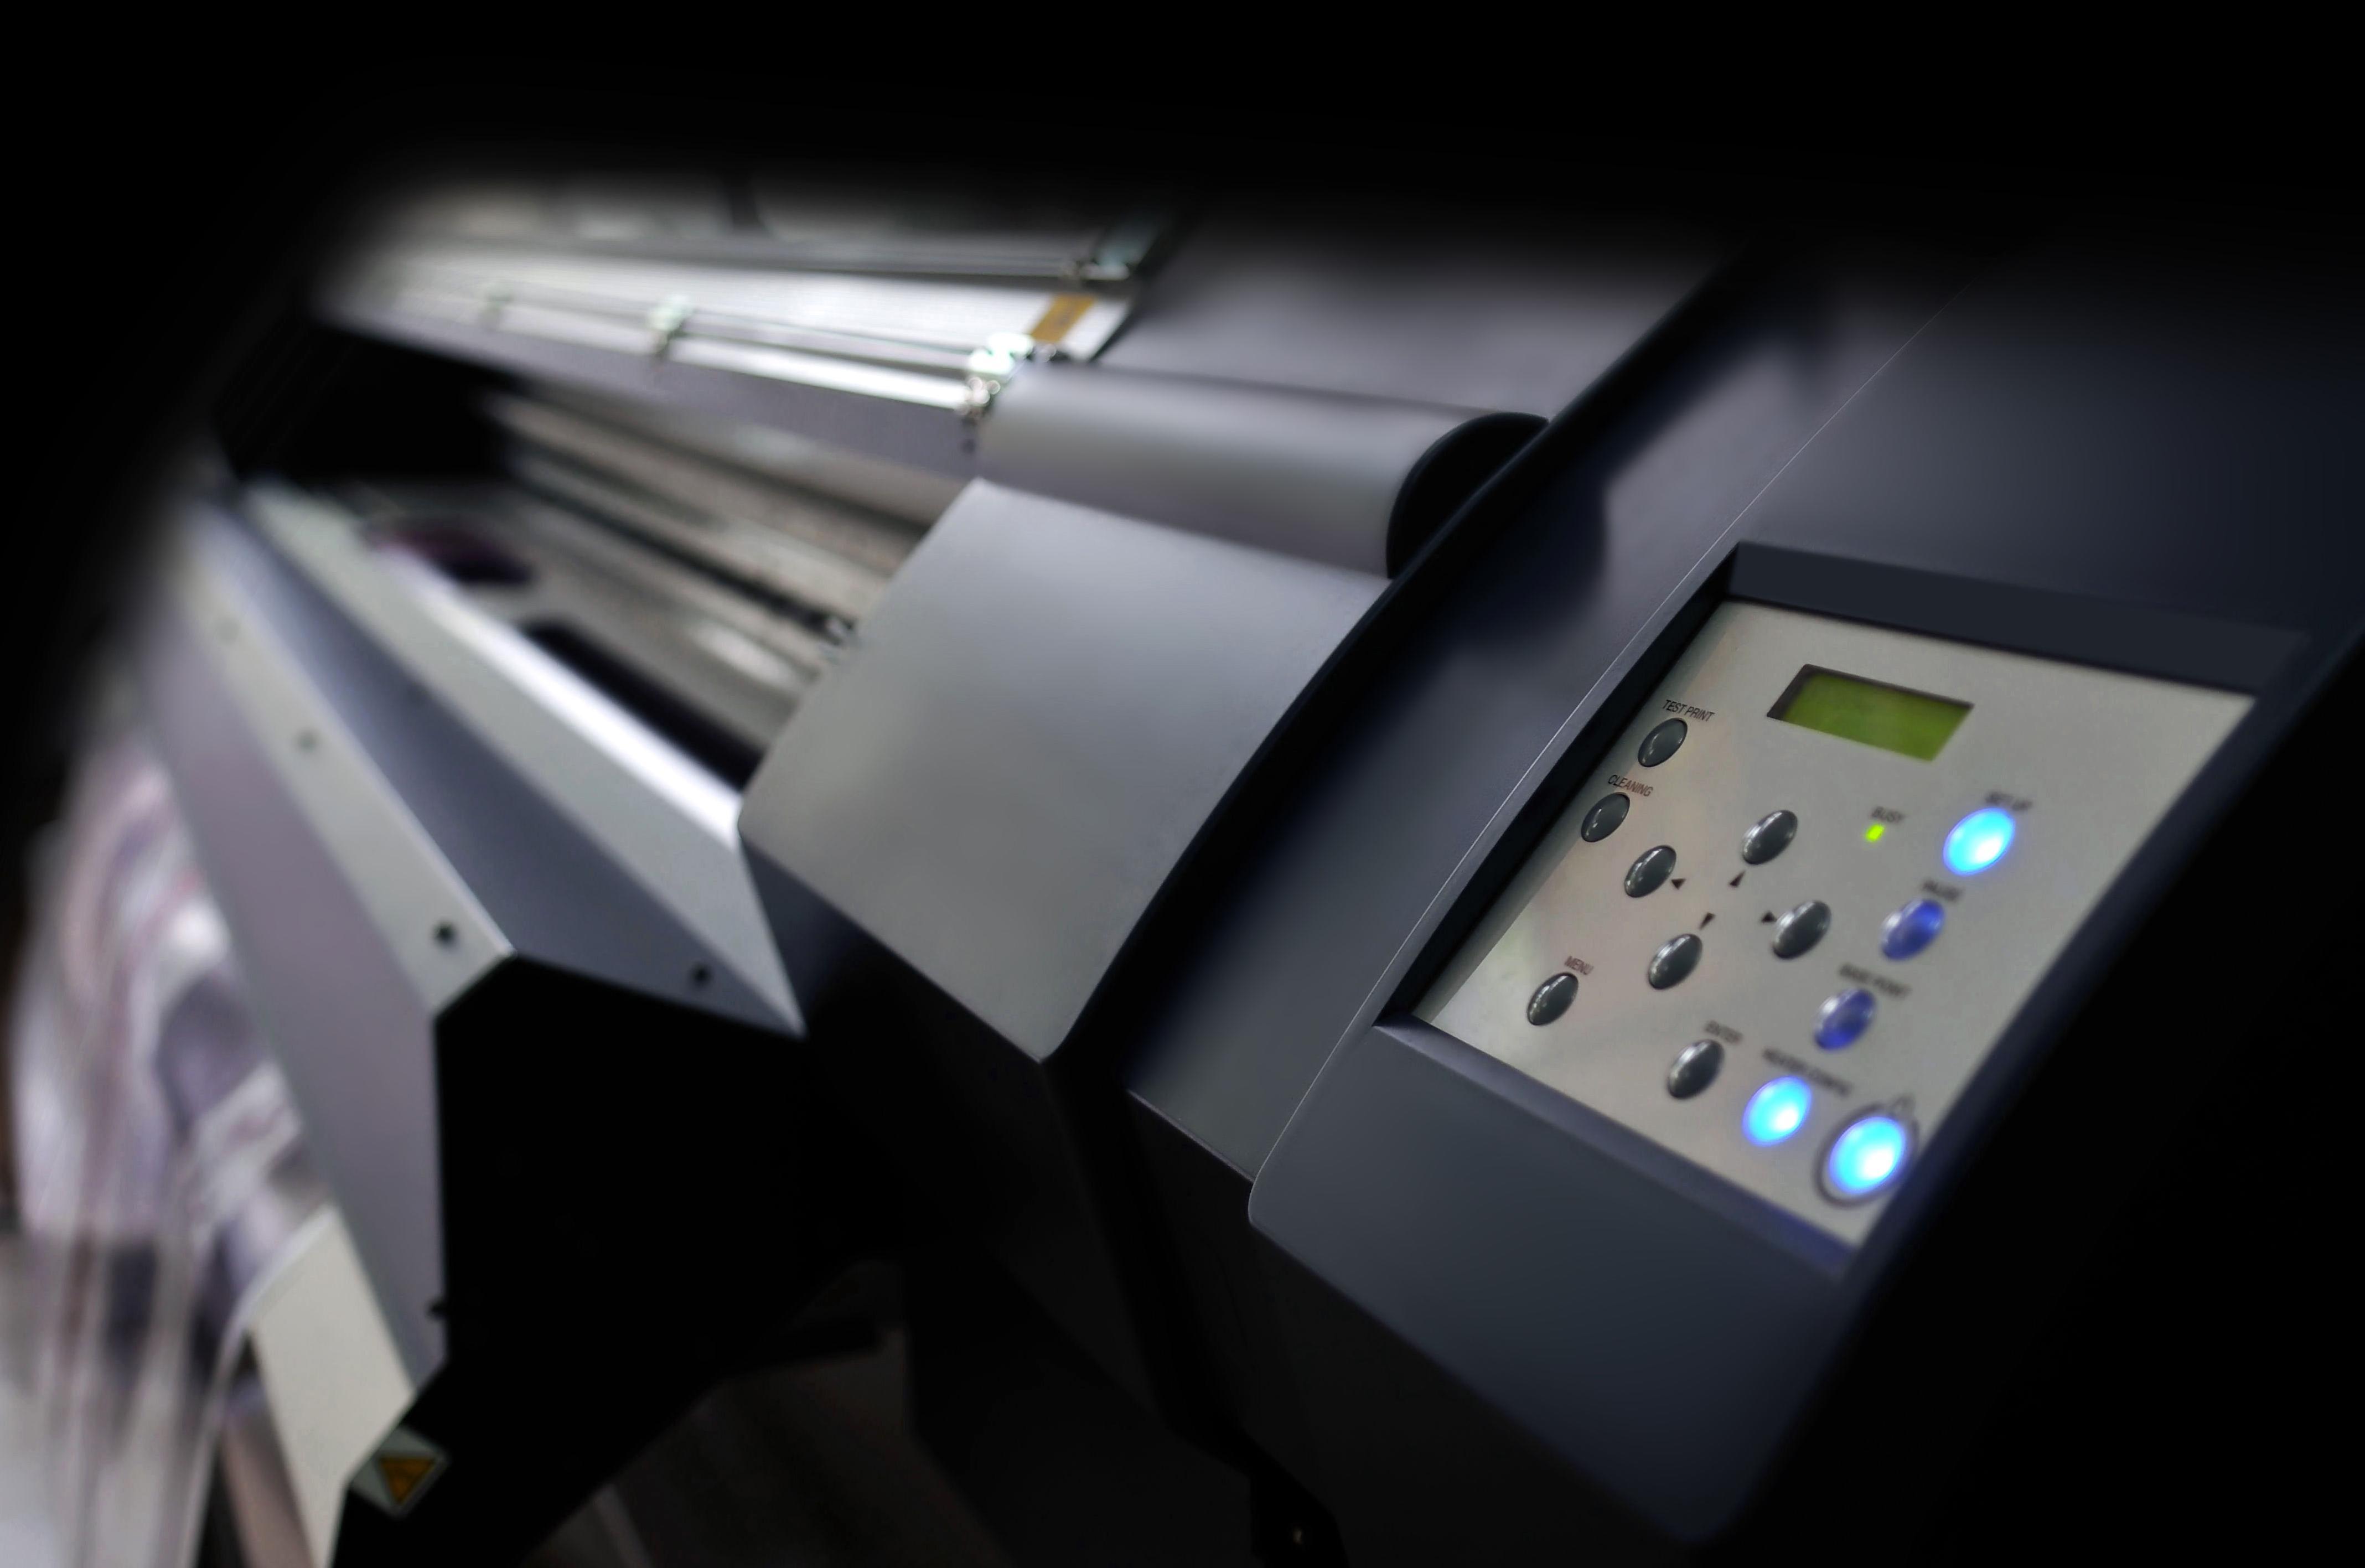 Impresión digital